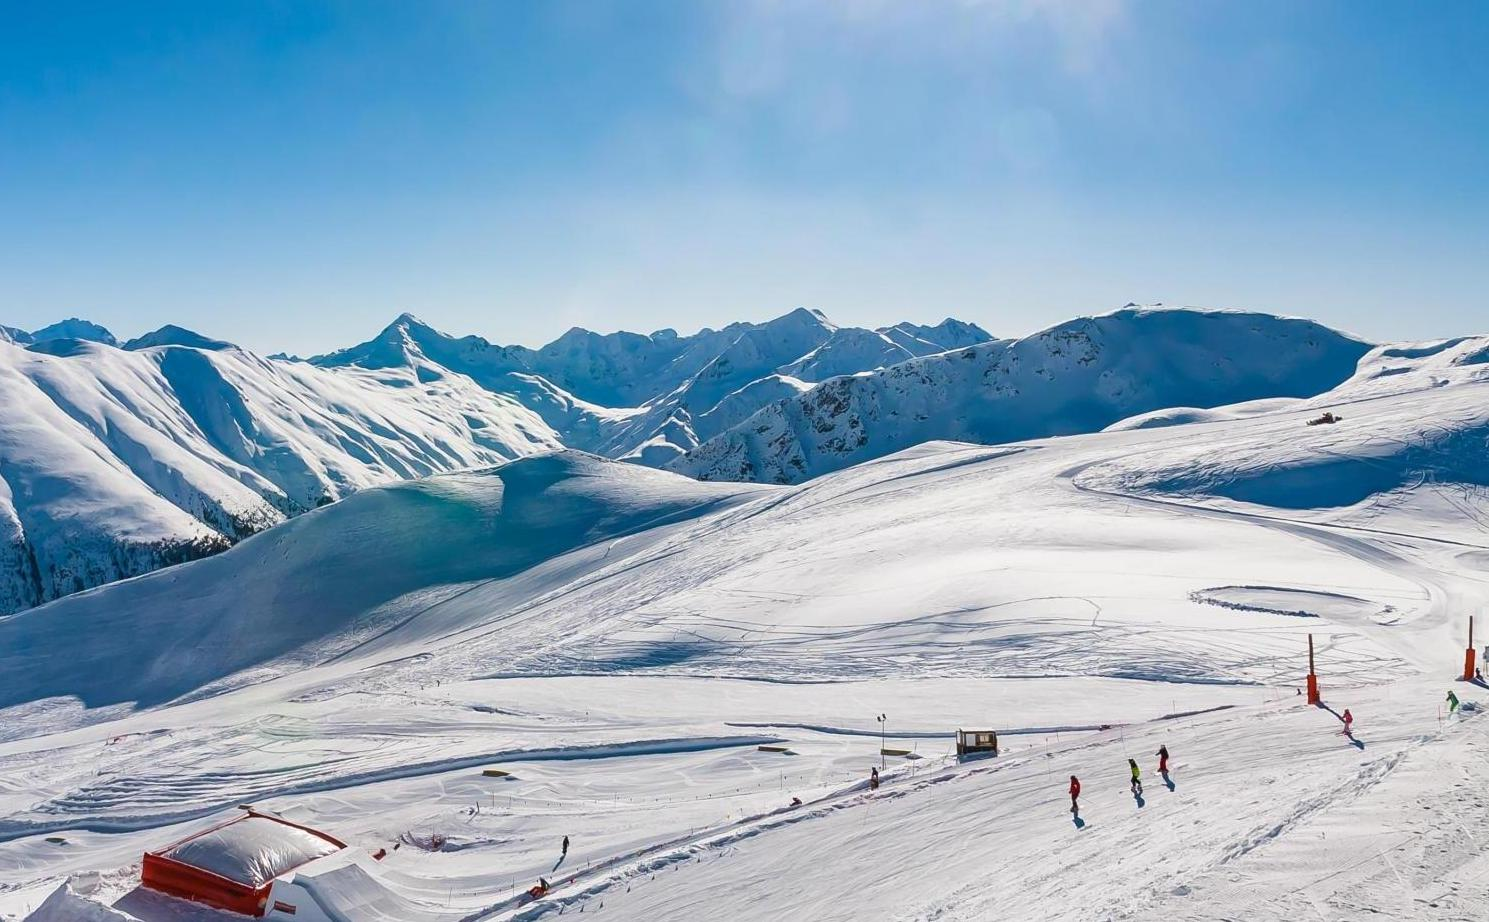 Livigno Best Ski Vacation slopes snowy peaks winter sports